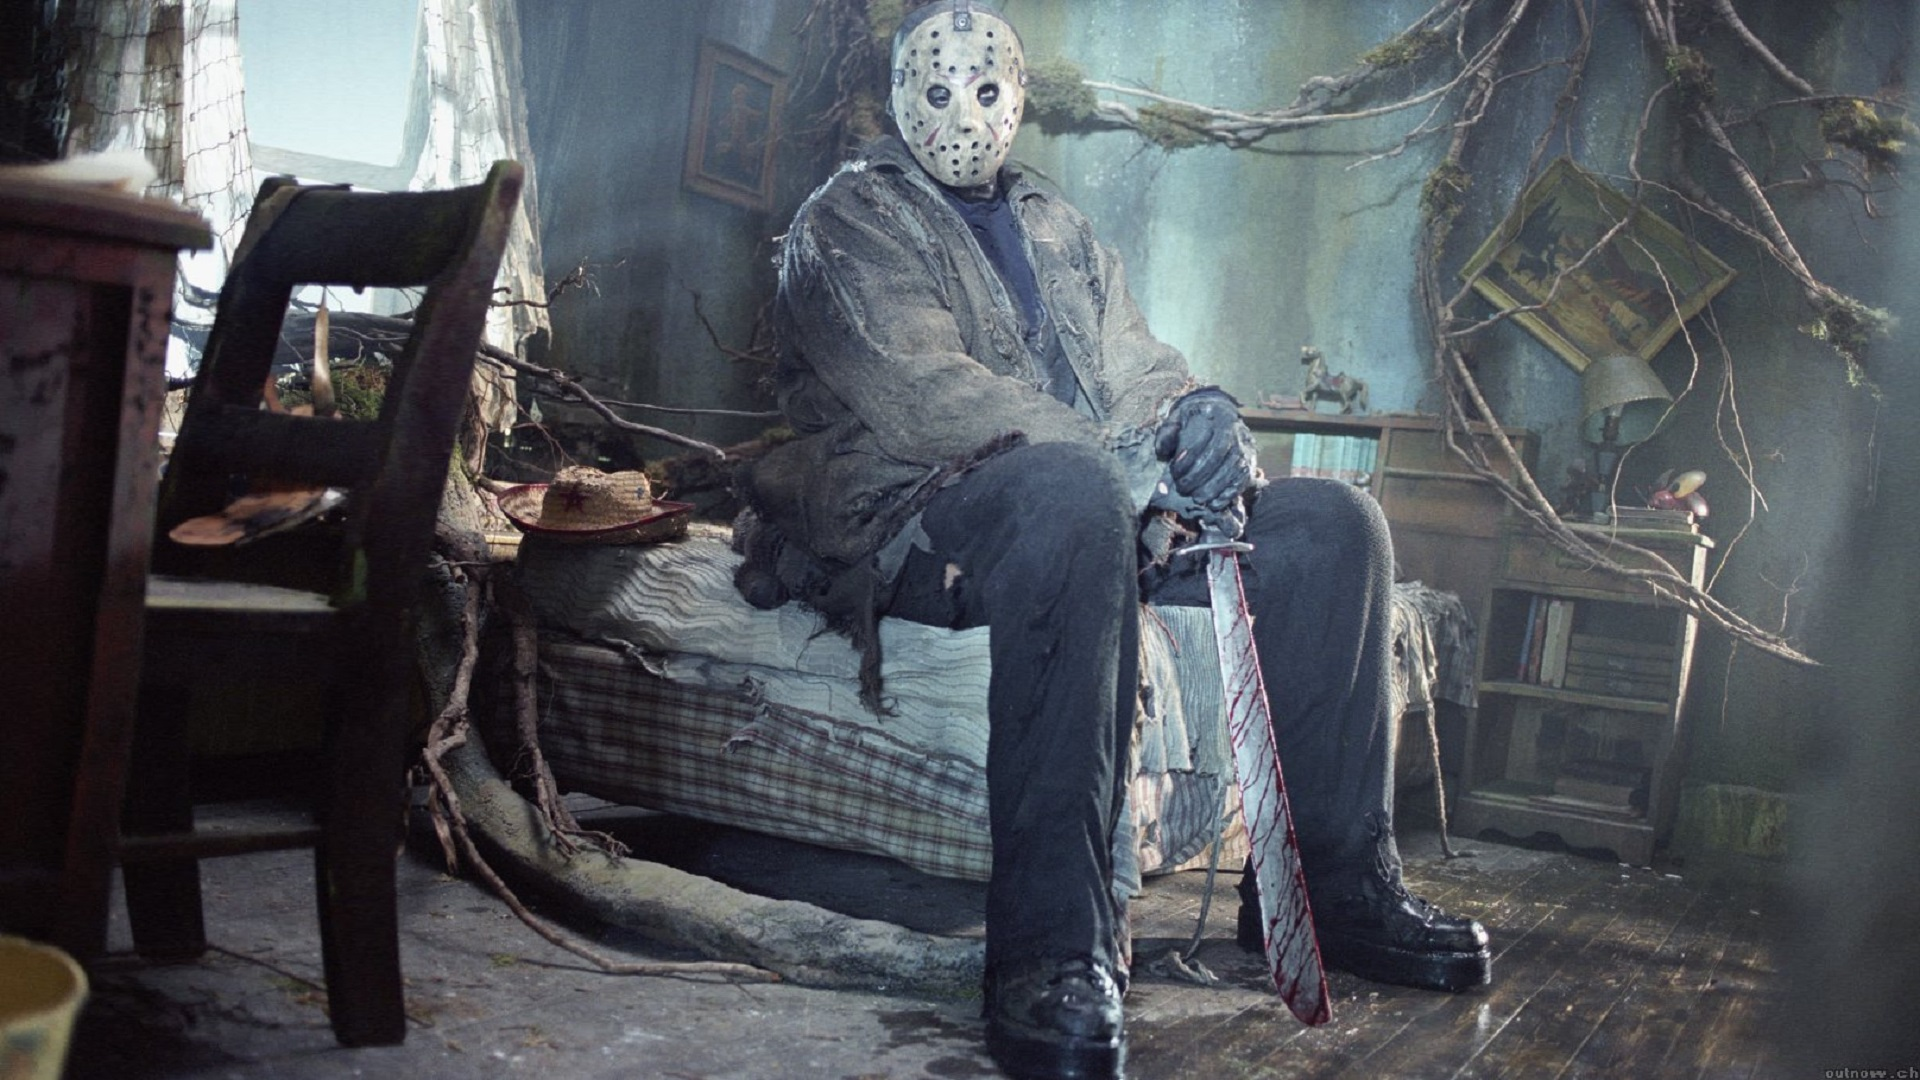 Jason Wallpapers Friday 13th - WallpaperSafari